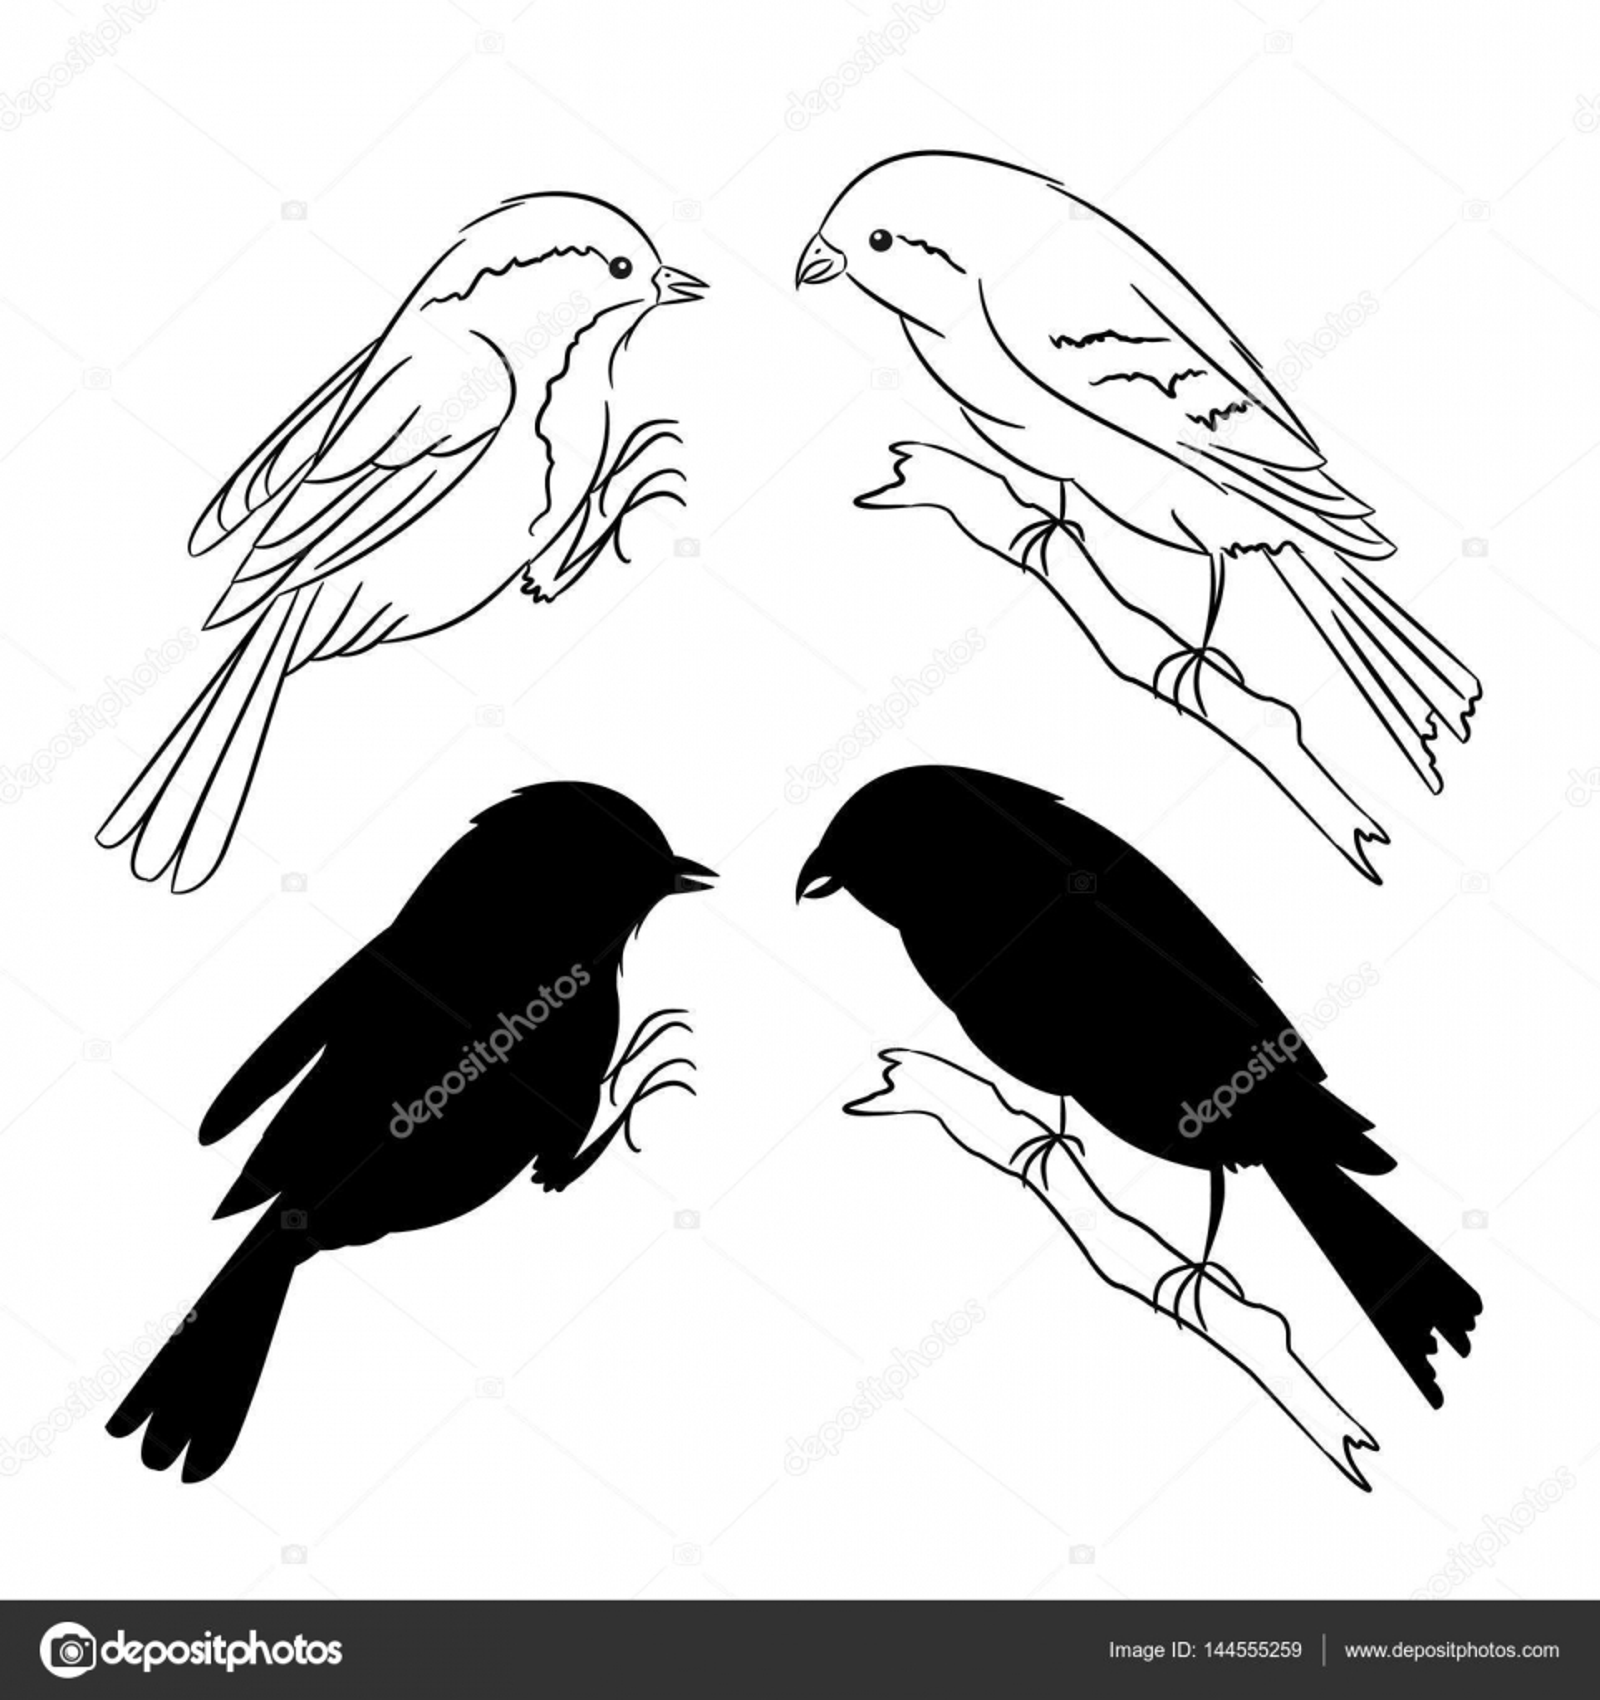 o contorno e da silhueta do conjunto de aves de três vector vetor